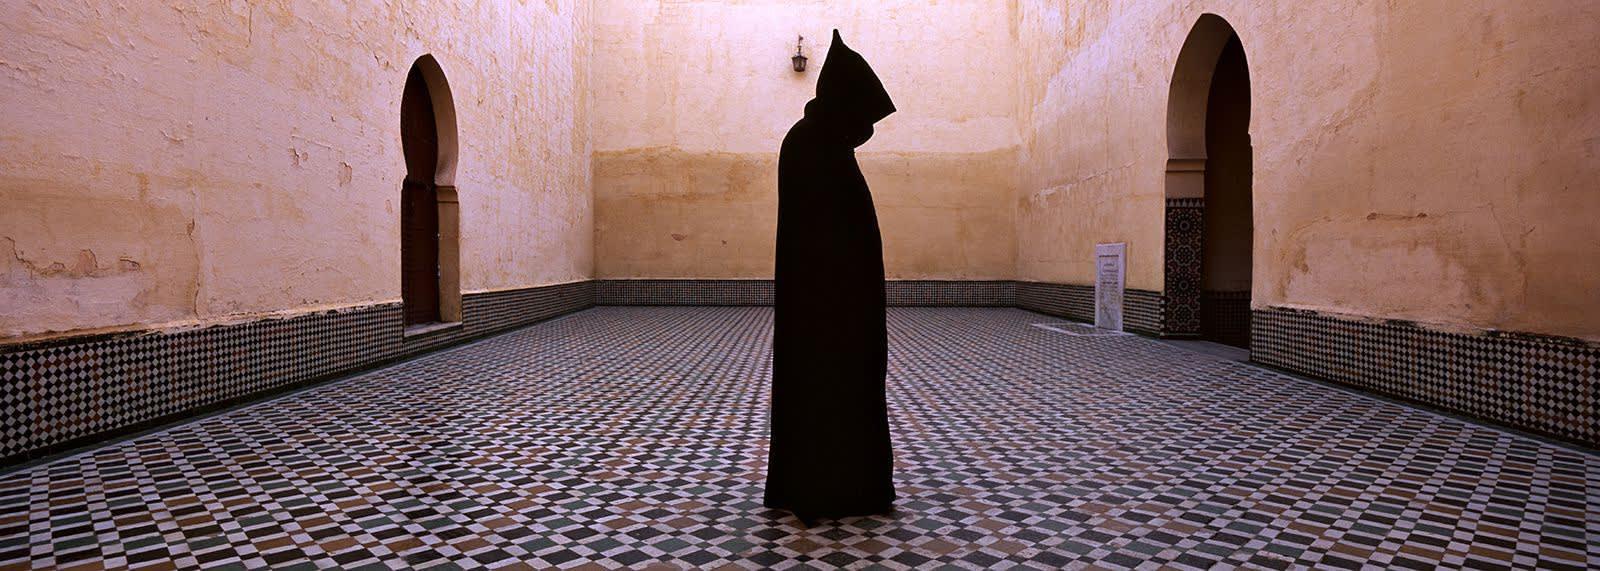 Matjaž Krivic, Meknes, Morocco, 2002 – 2006